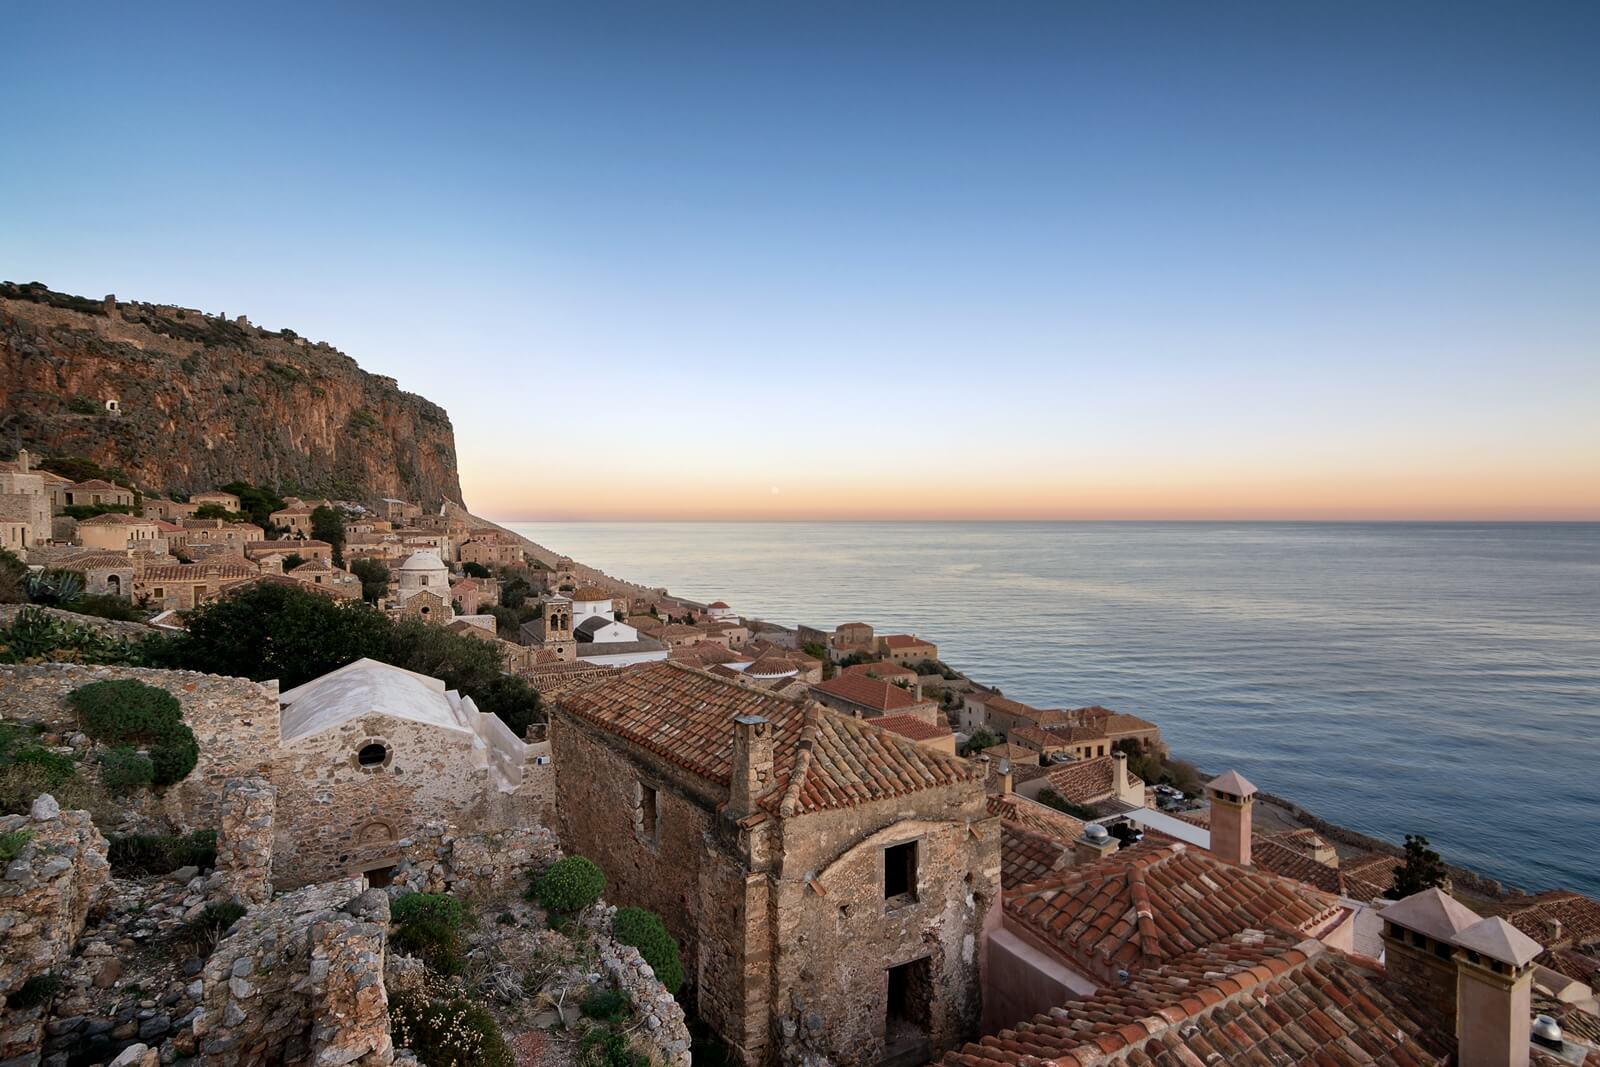 monemvasia-greece-lavienblog-allrightsreserved2